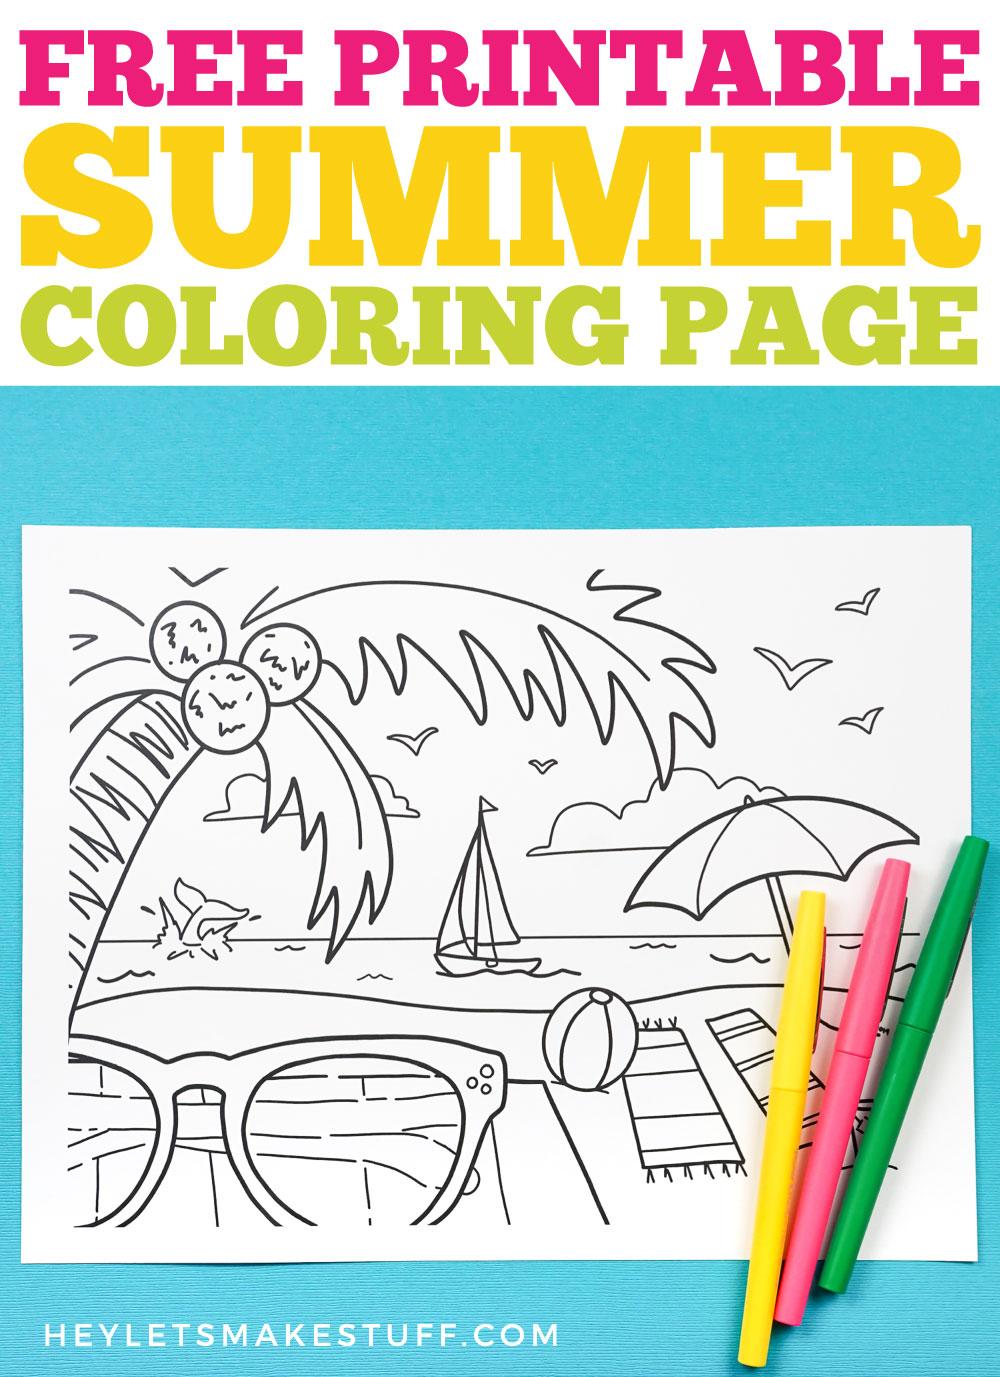 Free printable summer coloring page pin image